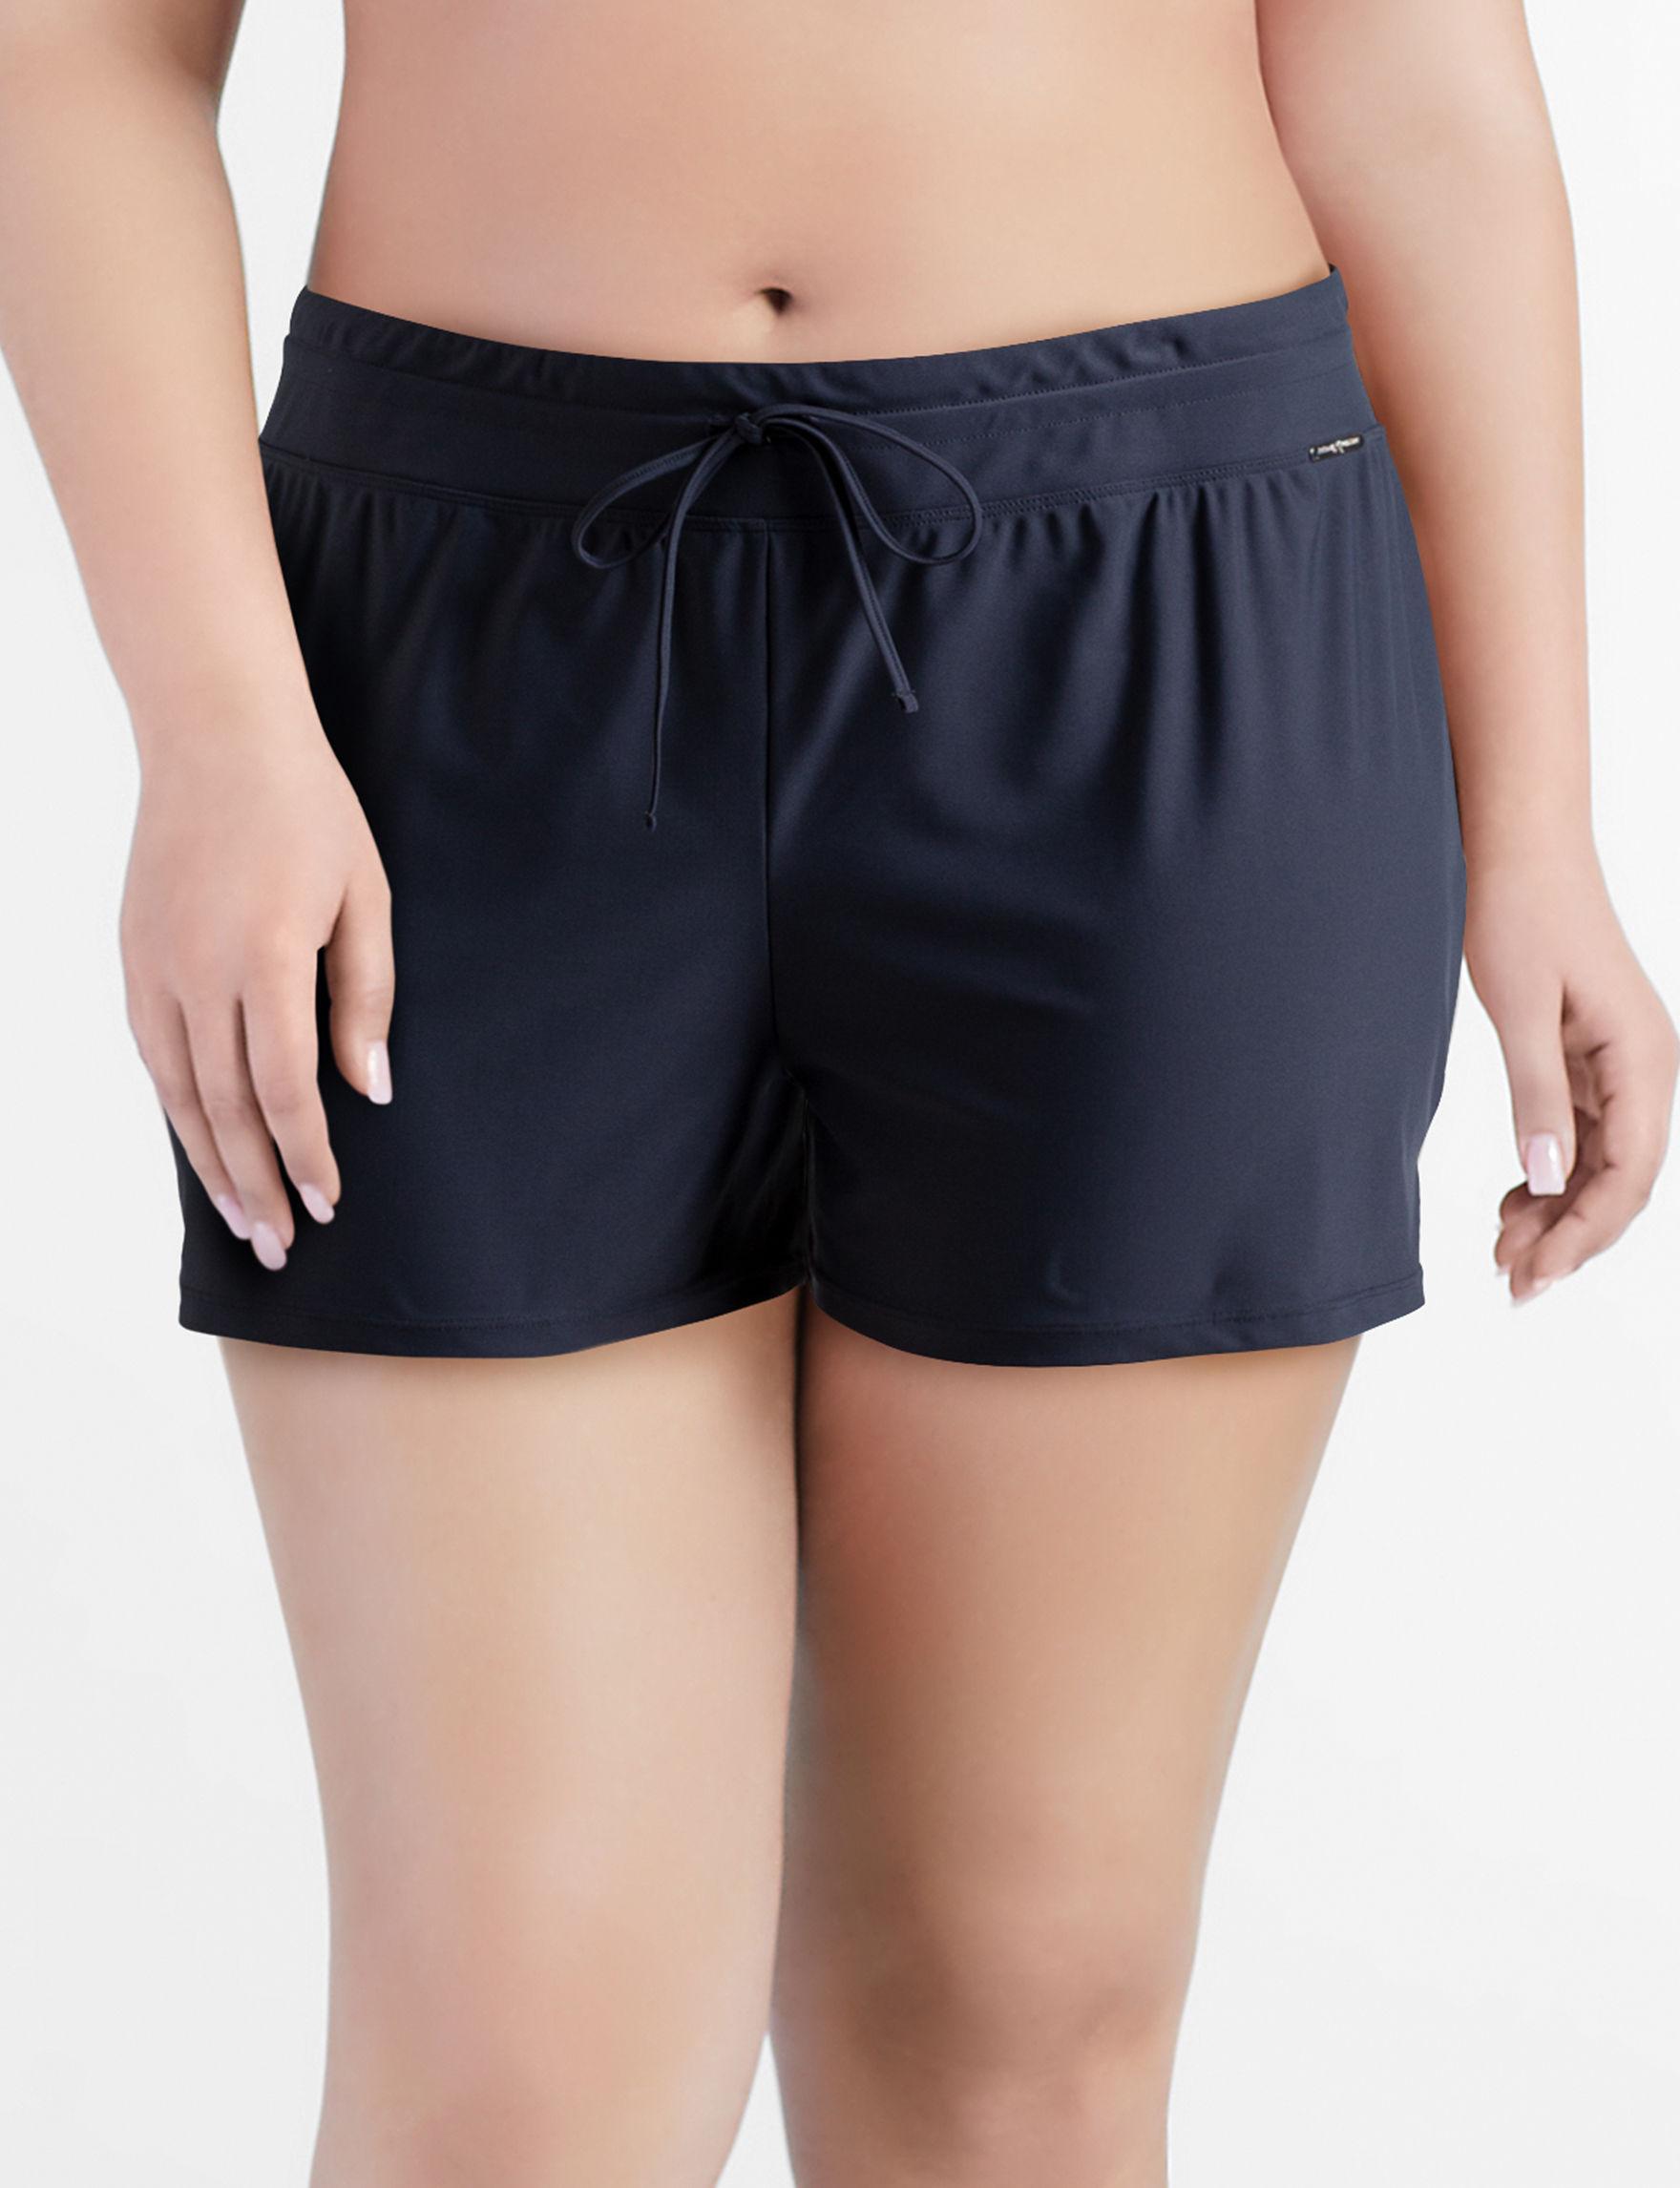 Zero Xposur Slate Swimsuit Bottoms Boyshort